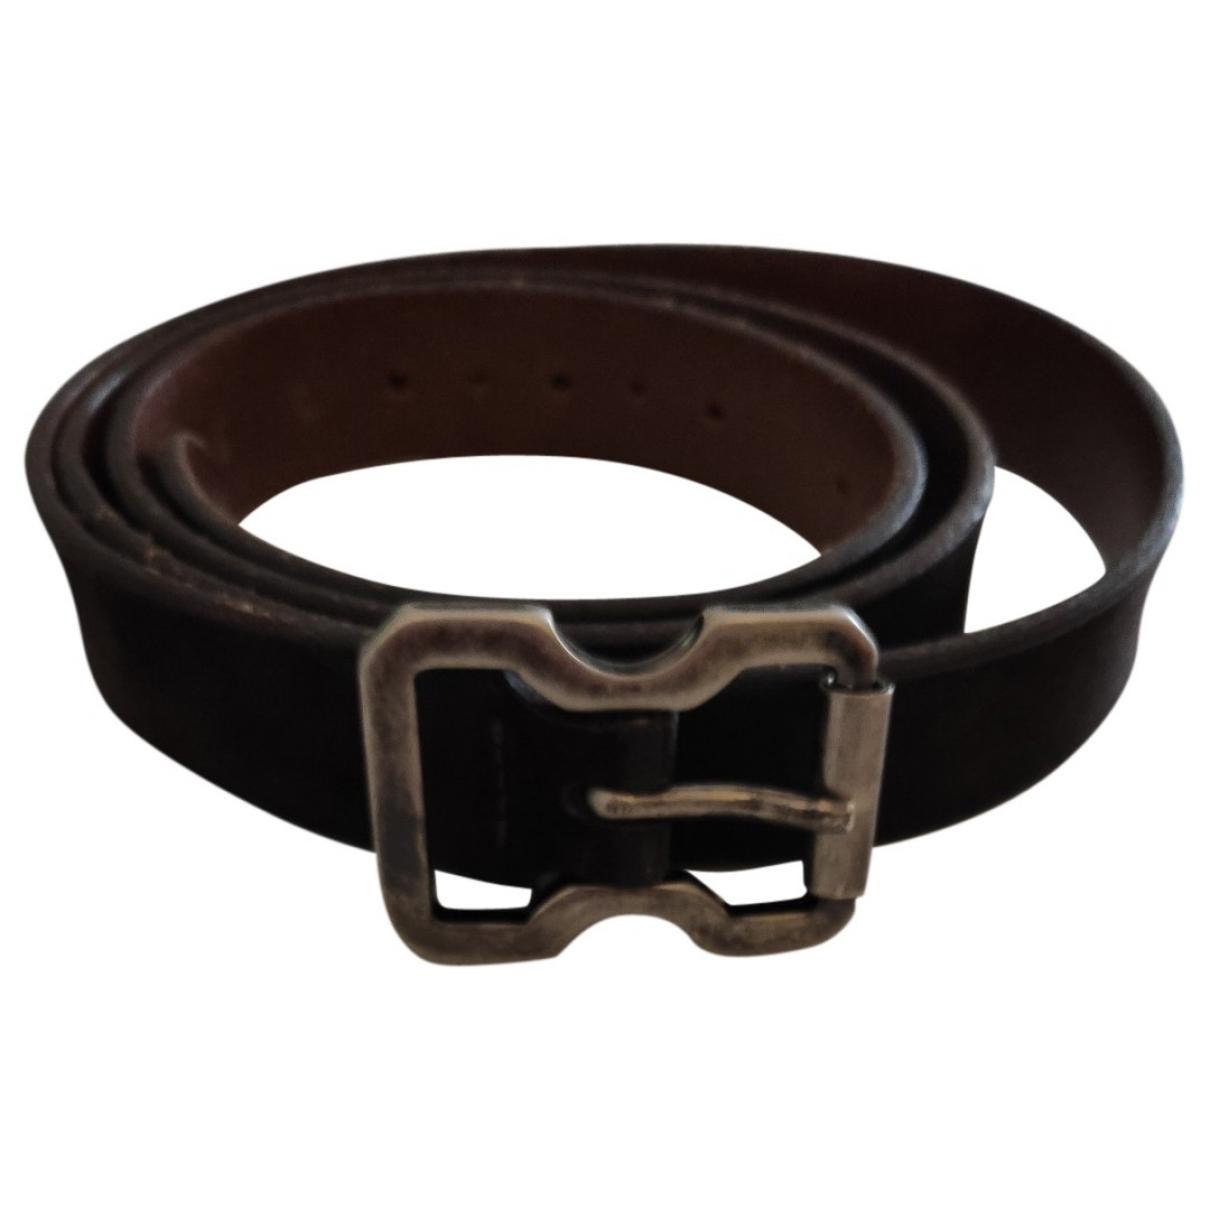 Maison Martin Margiela \N Brown Leather belt for Men 90 cm